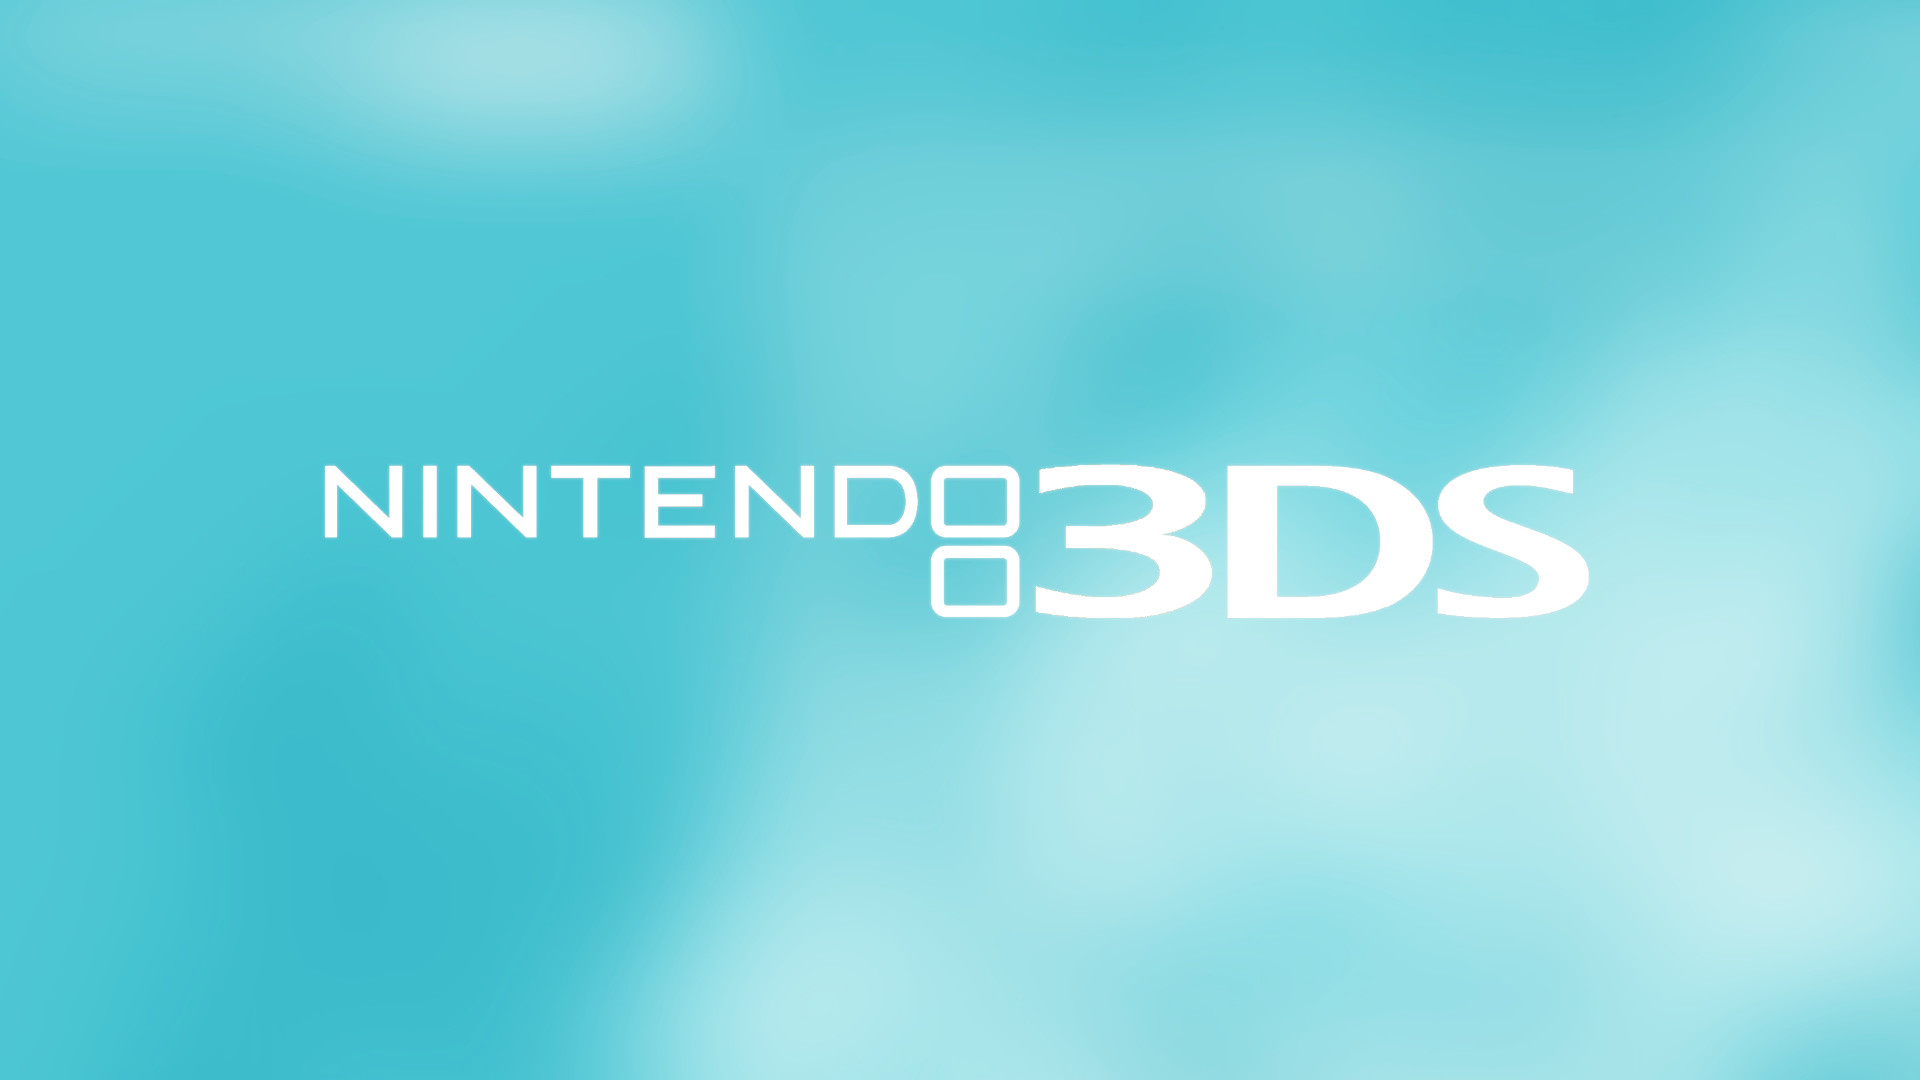 Video Game – Nintendo 3DS Wallpaper